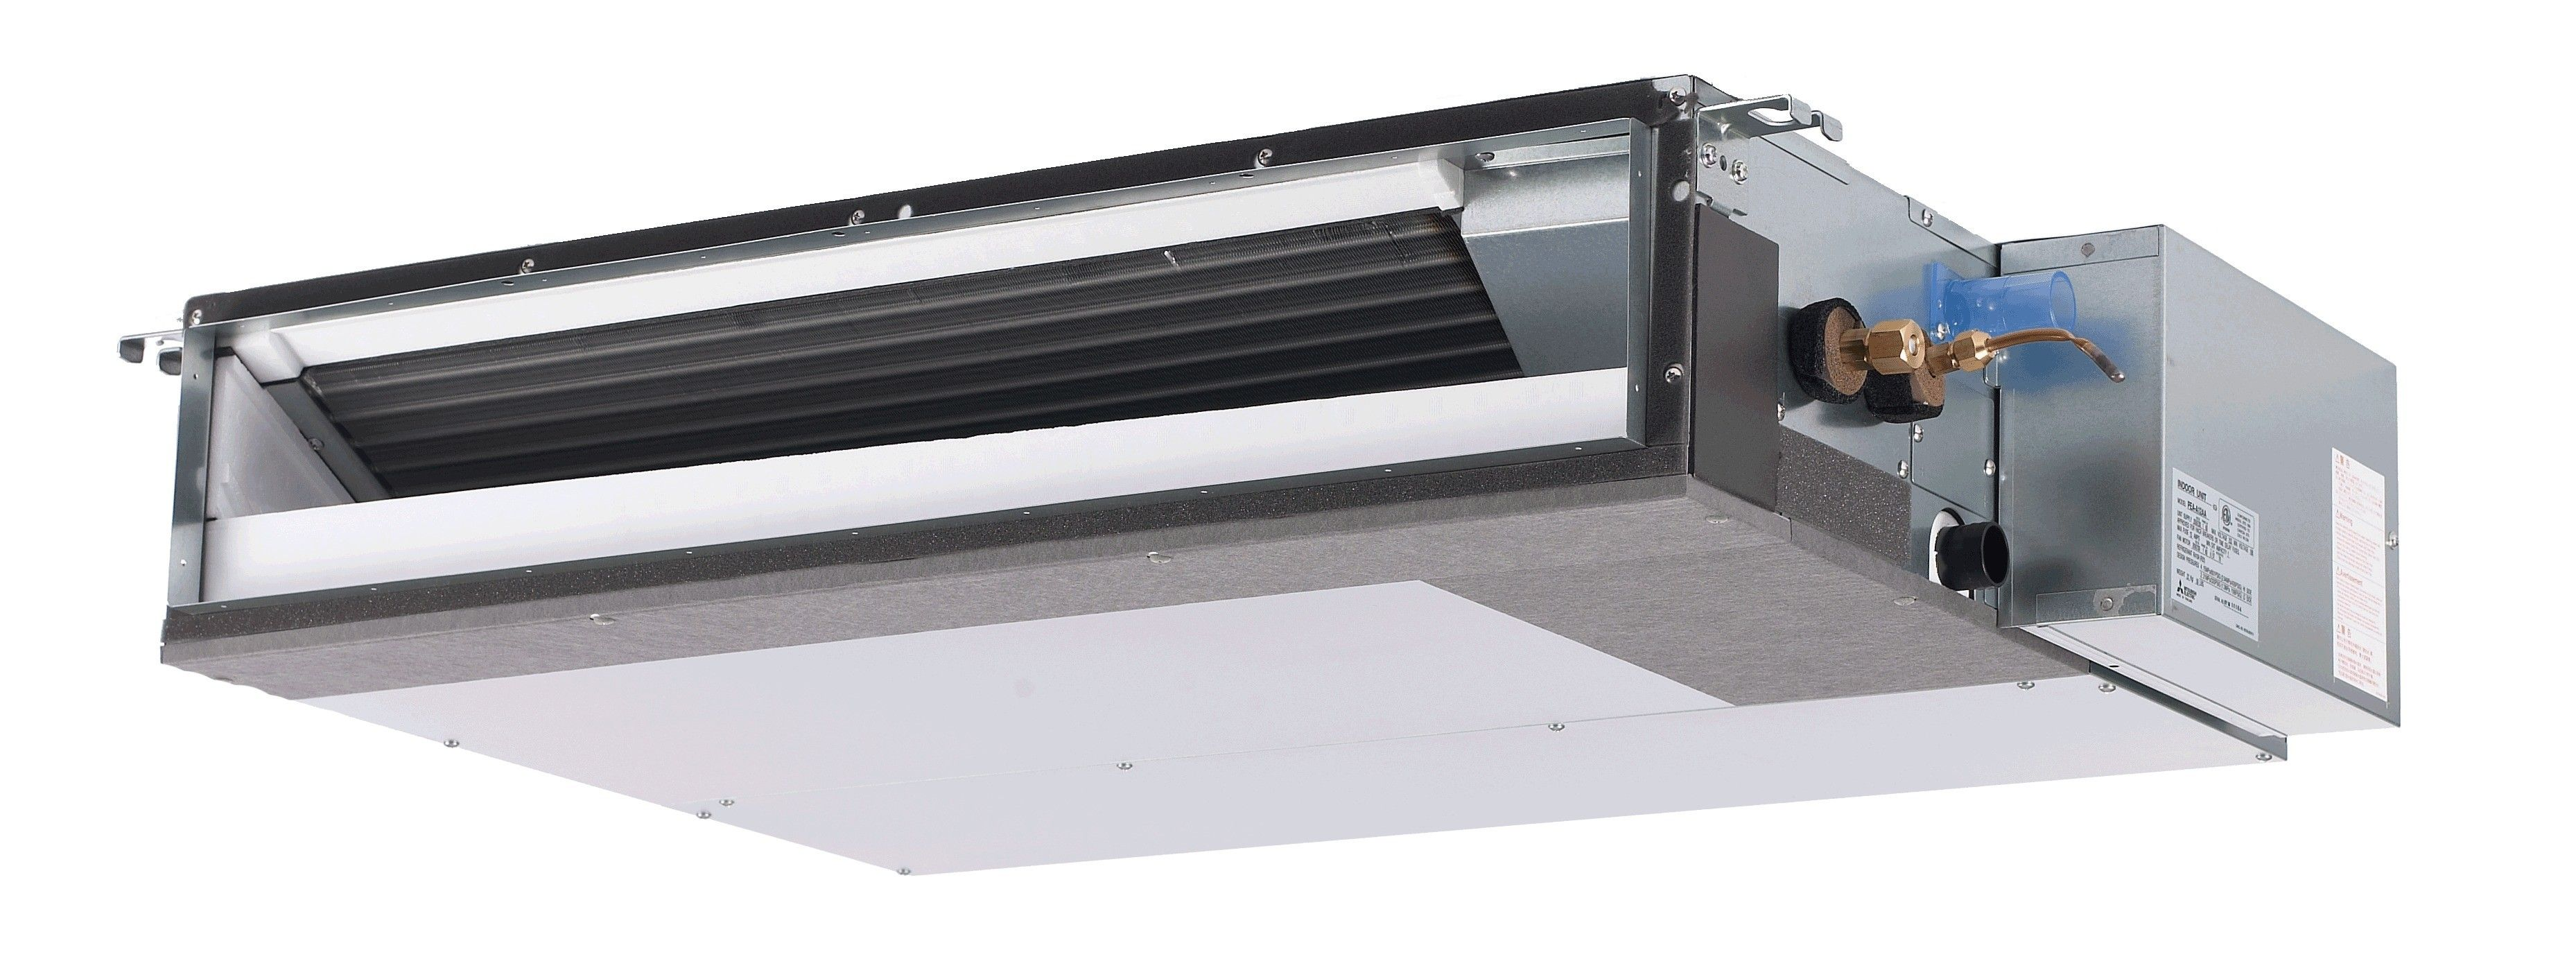 18K BTU Mitsubishi SEZKD Horizontal Ducted Heat Pump Indoor Unit